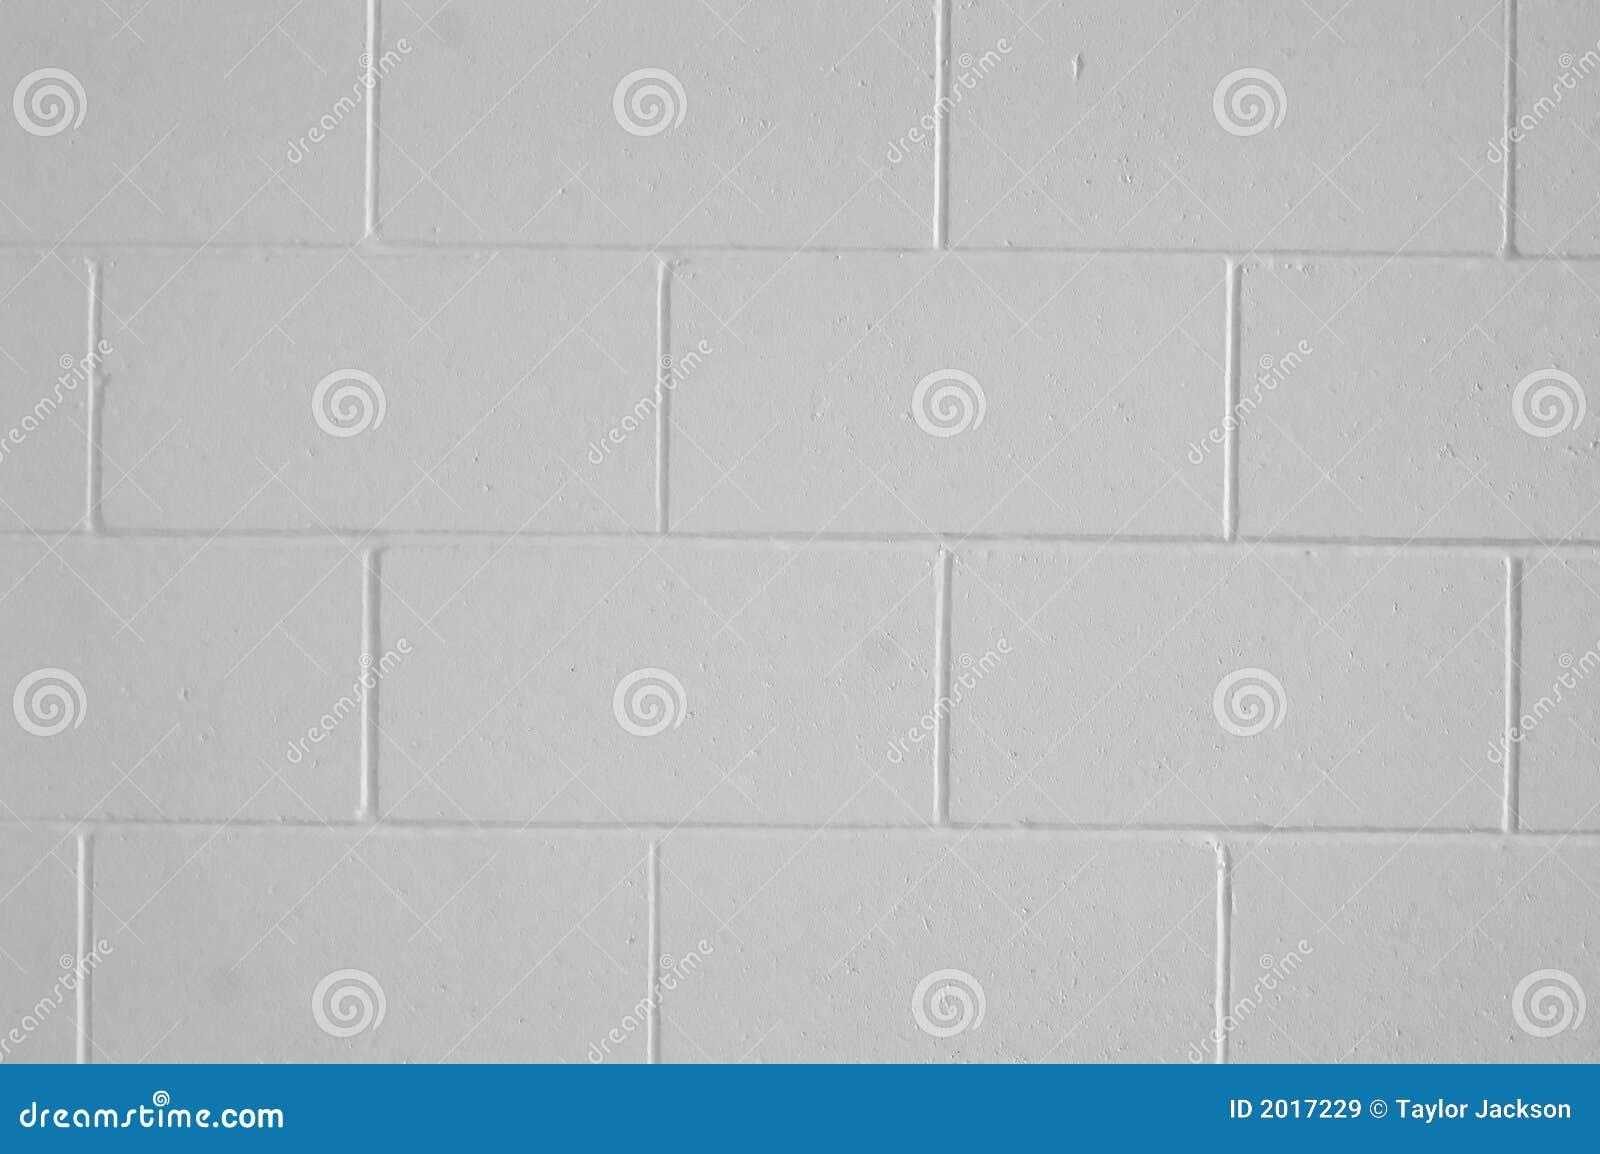 A Cinderblock Wall Royalty Free Stock Images Image - Cinder block wall